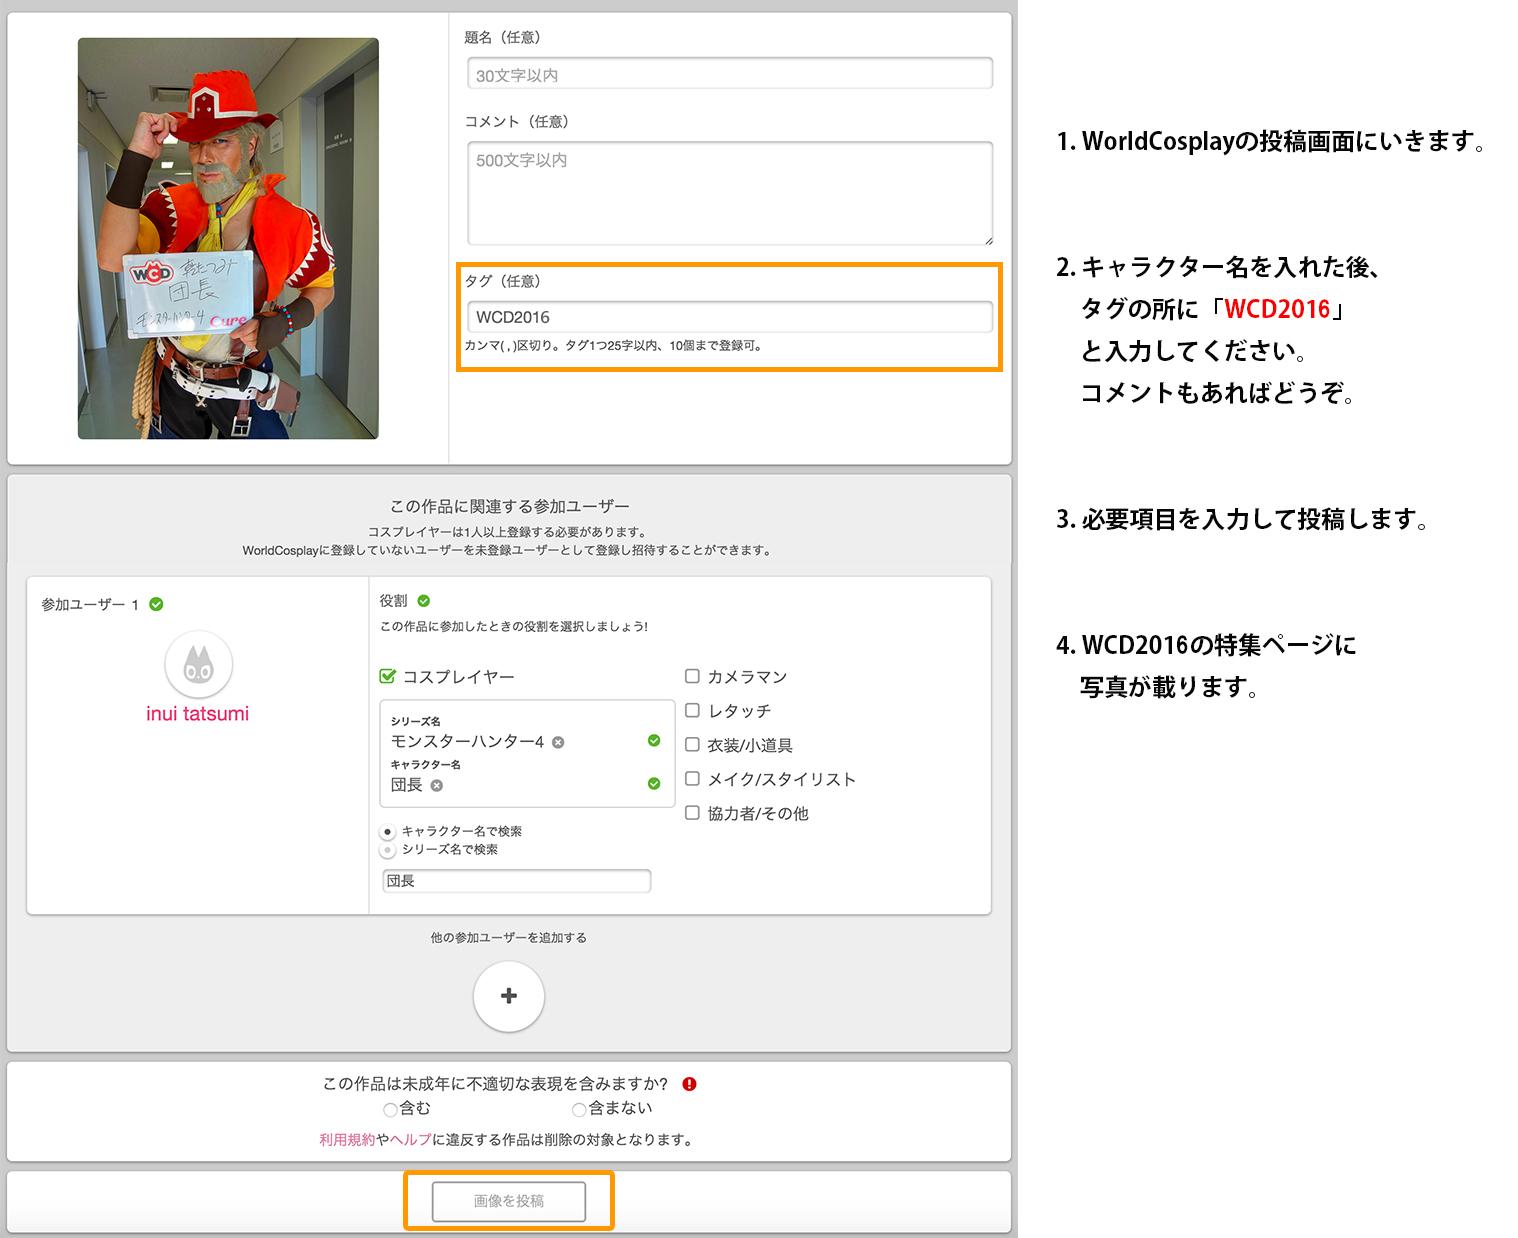 jp1_wcd2015_info